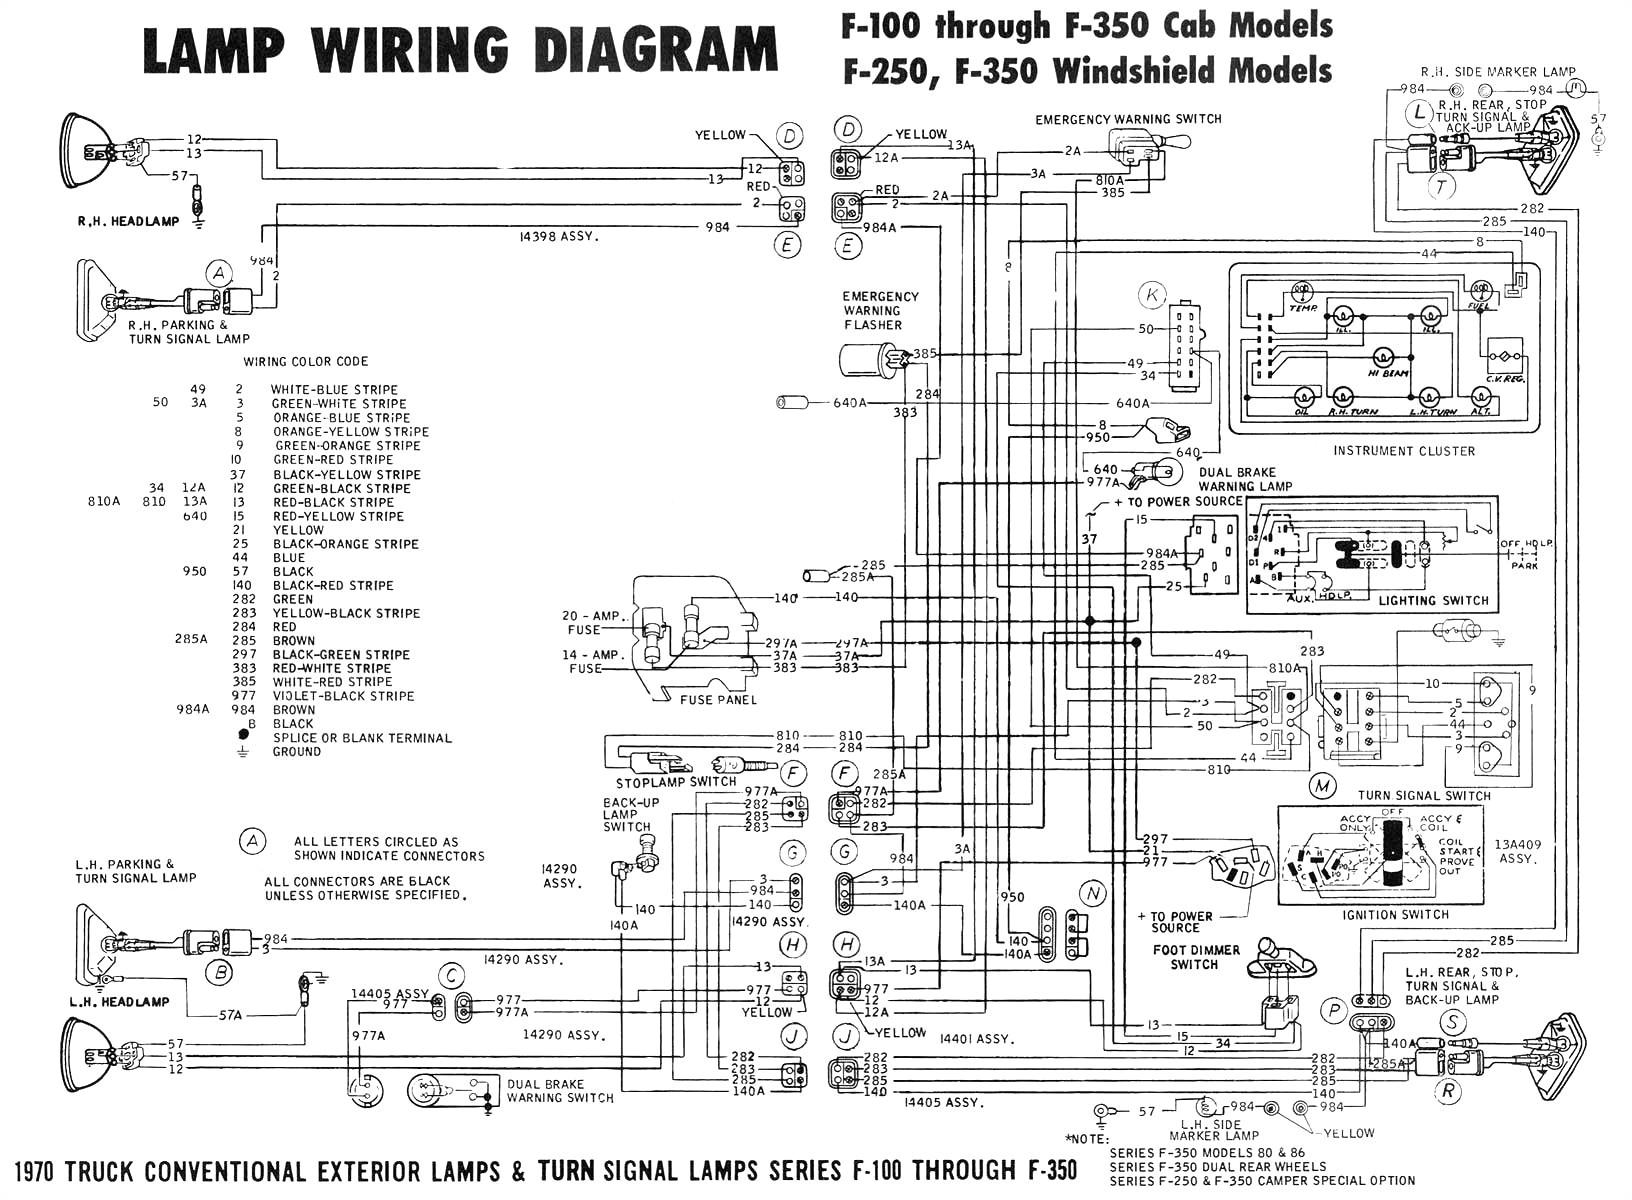 toyota l200 wiring diagram premium wiring diagram blog toyota l200 wiring diagram